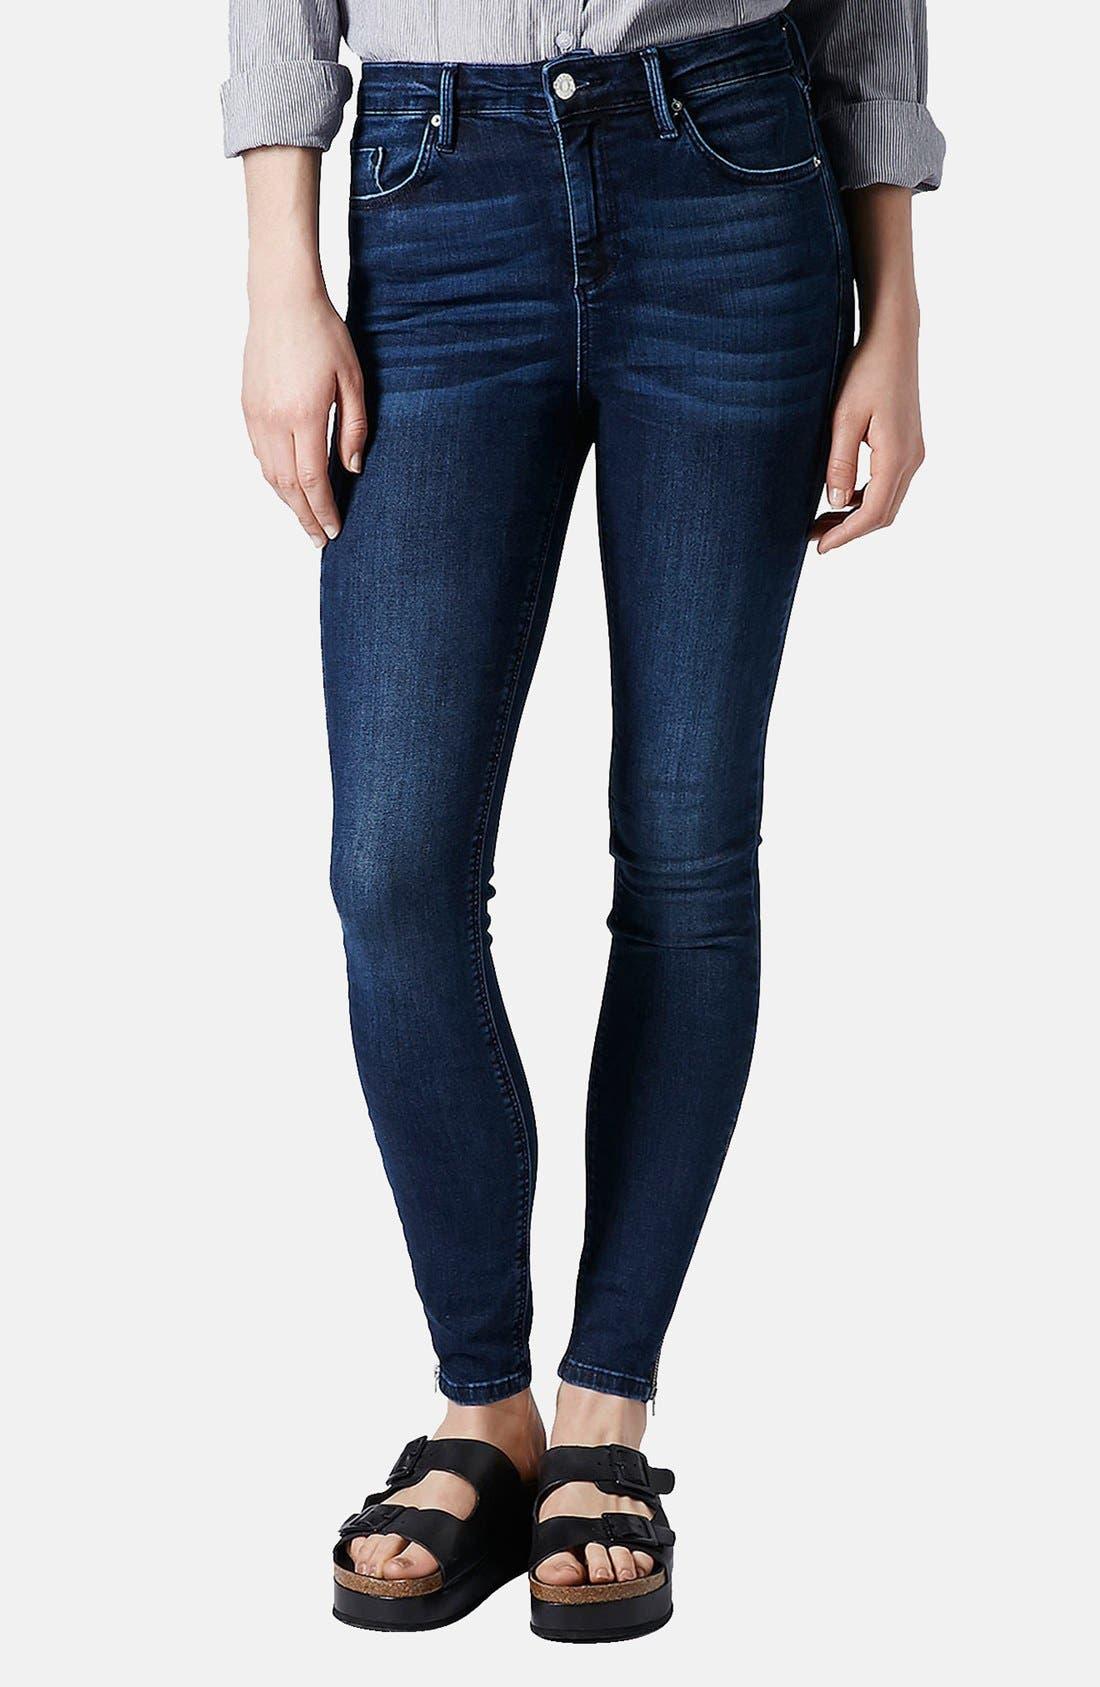 Main Image - Topshop Moto 'Jamie' Zip Cuff High Waist Skinny Jeans (Dark)